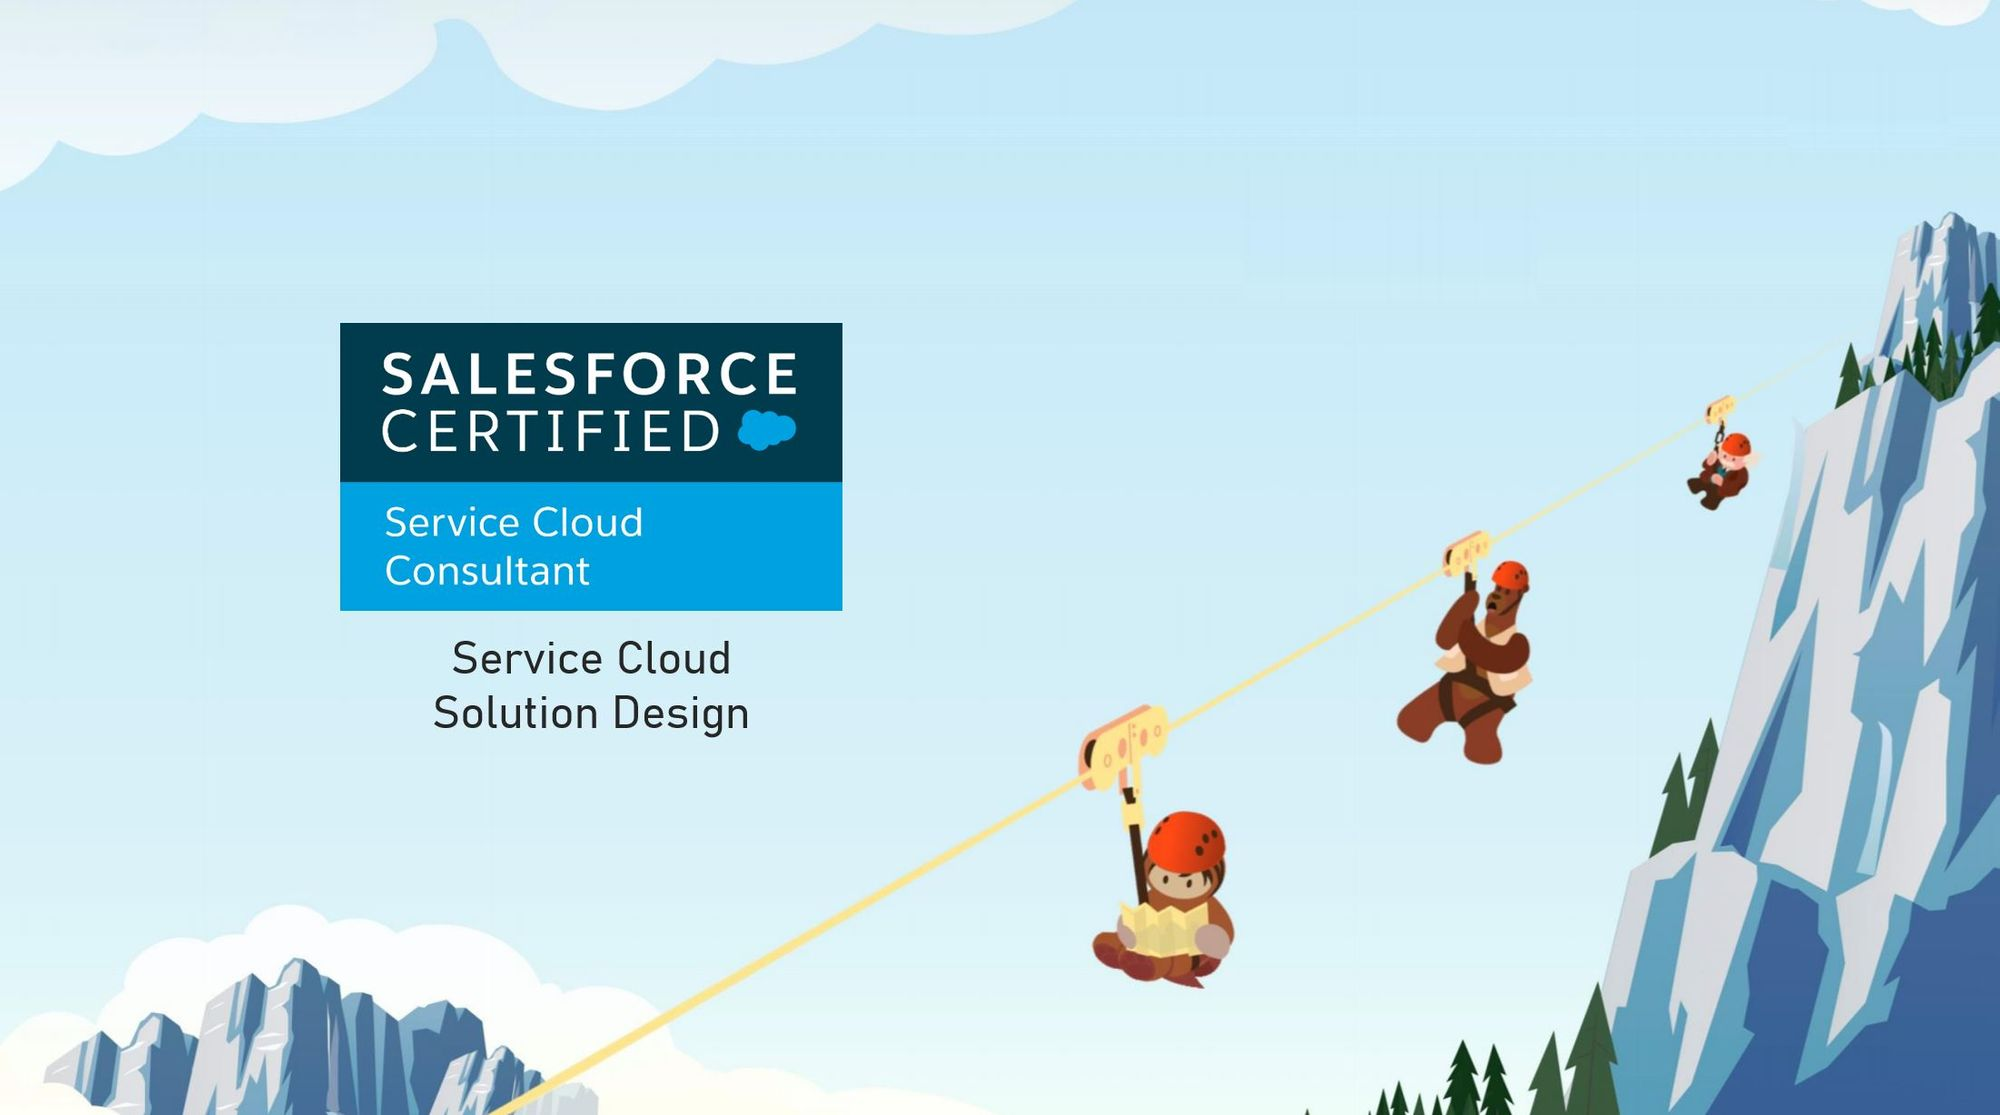 Salesforce Service Cloud Consultant Exam Preparation: Service Cloud Solution Design